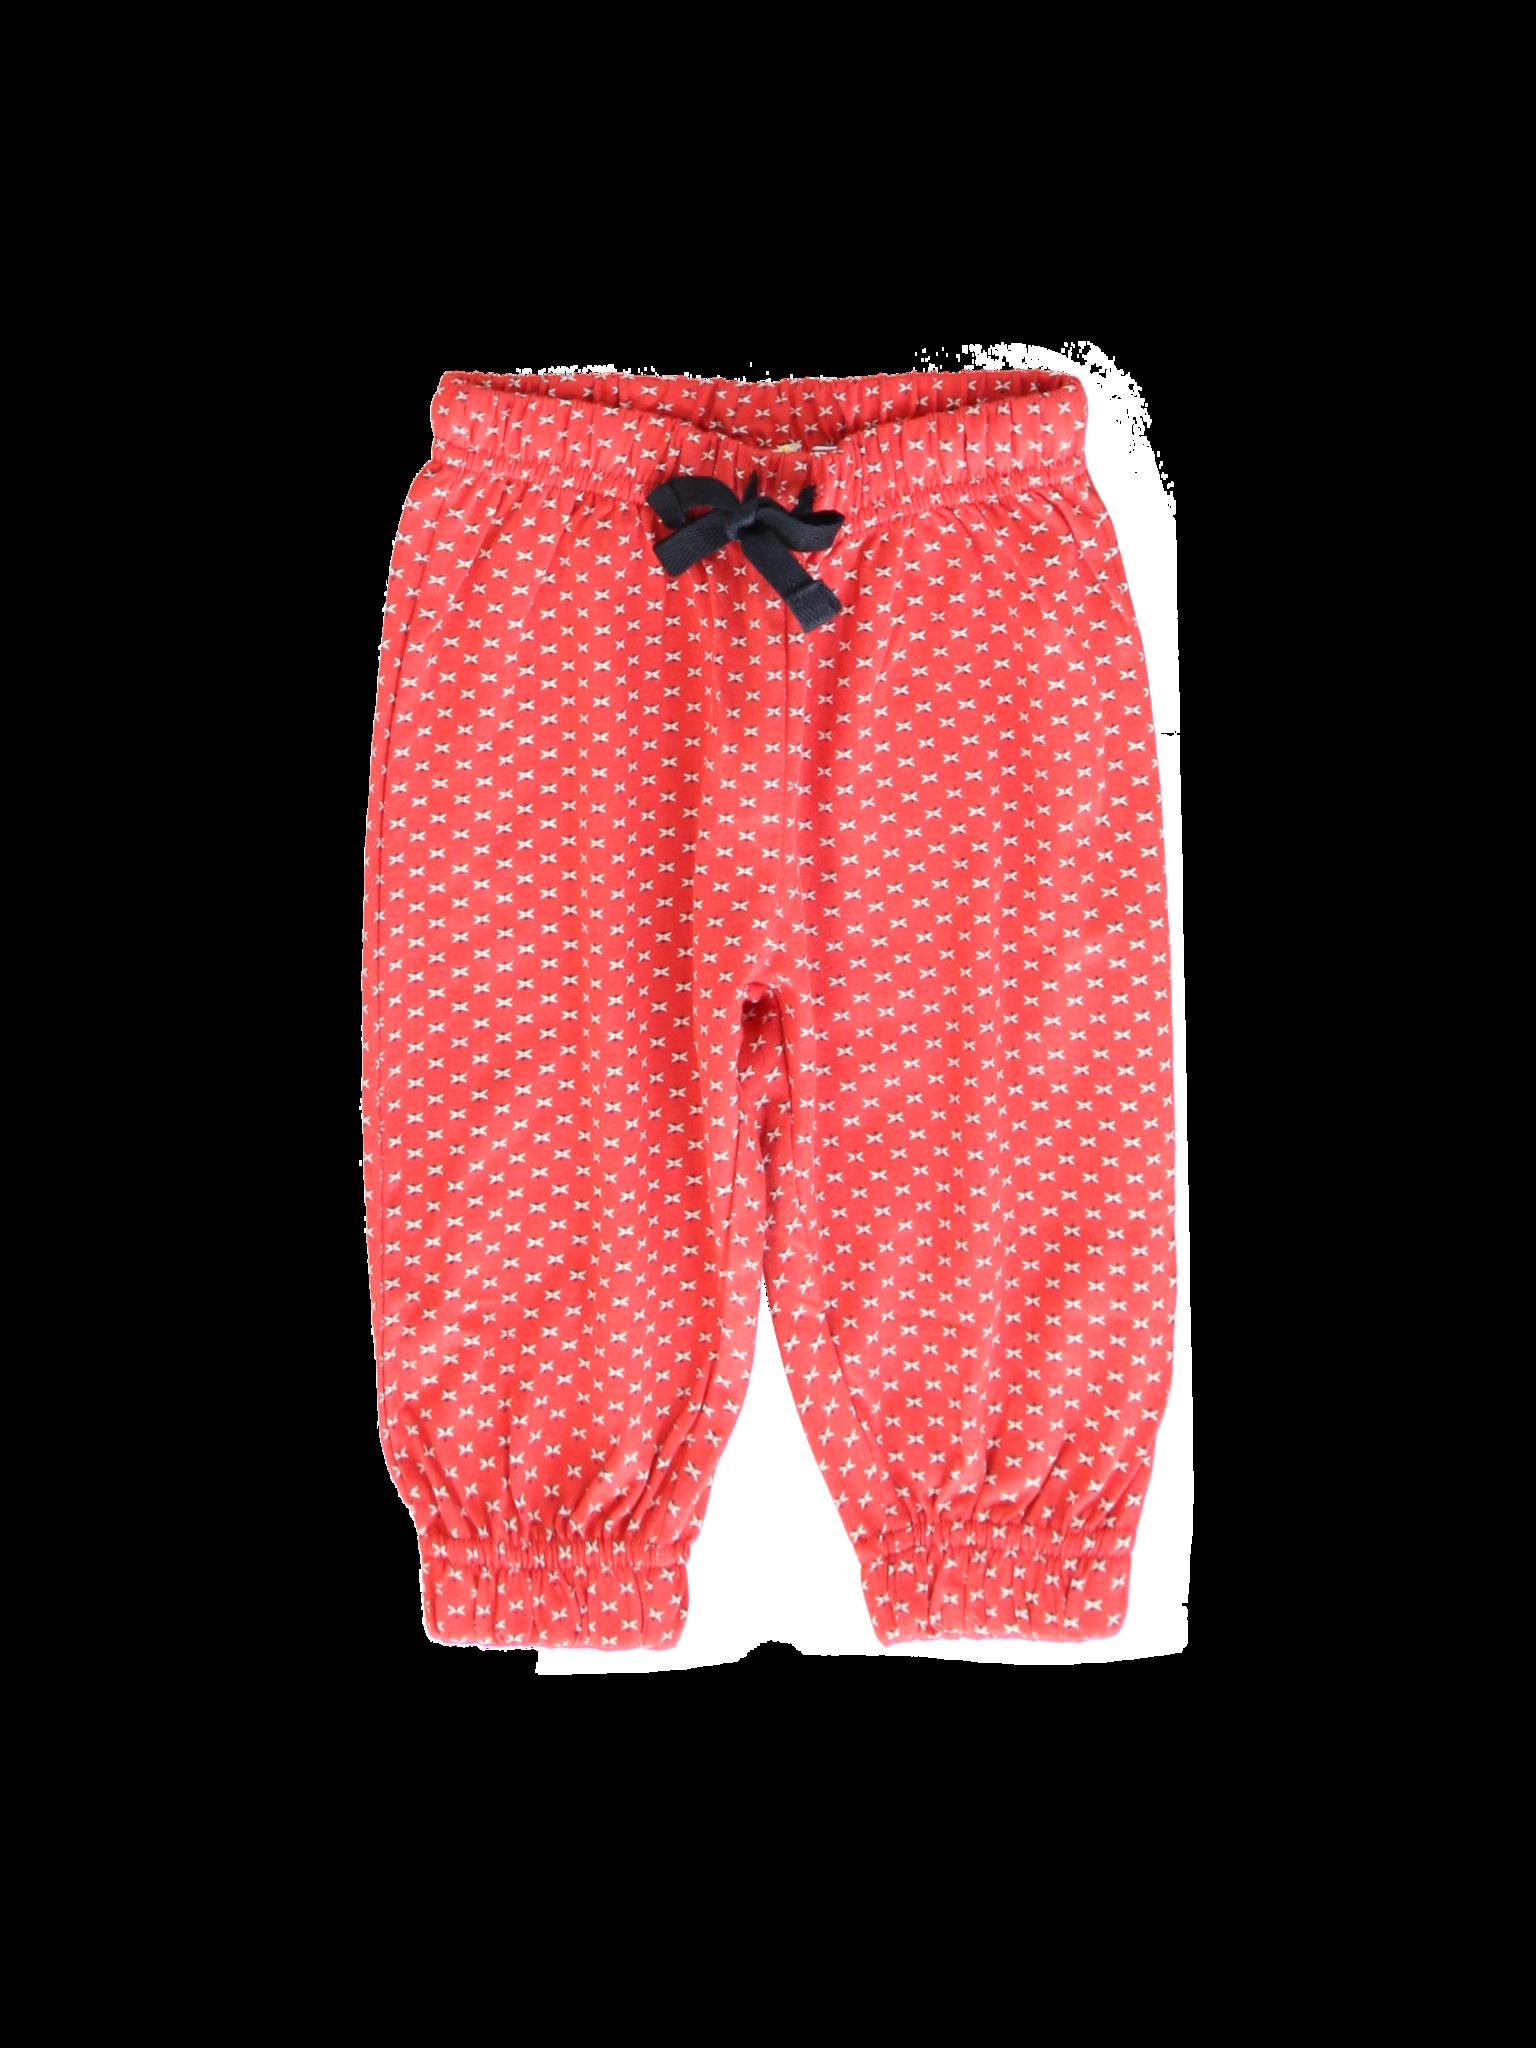 All Brands | Summerproducts Baby | Pants | 8 pcs/box